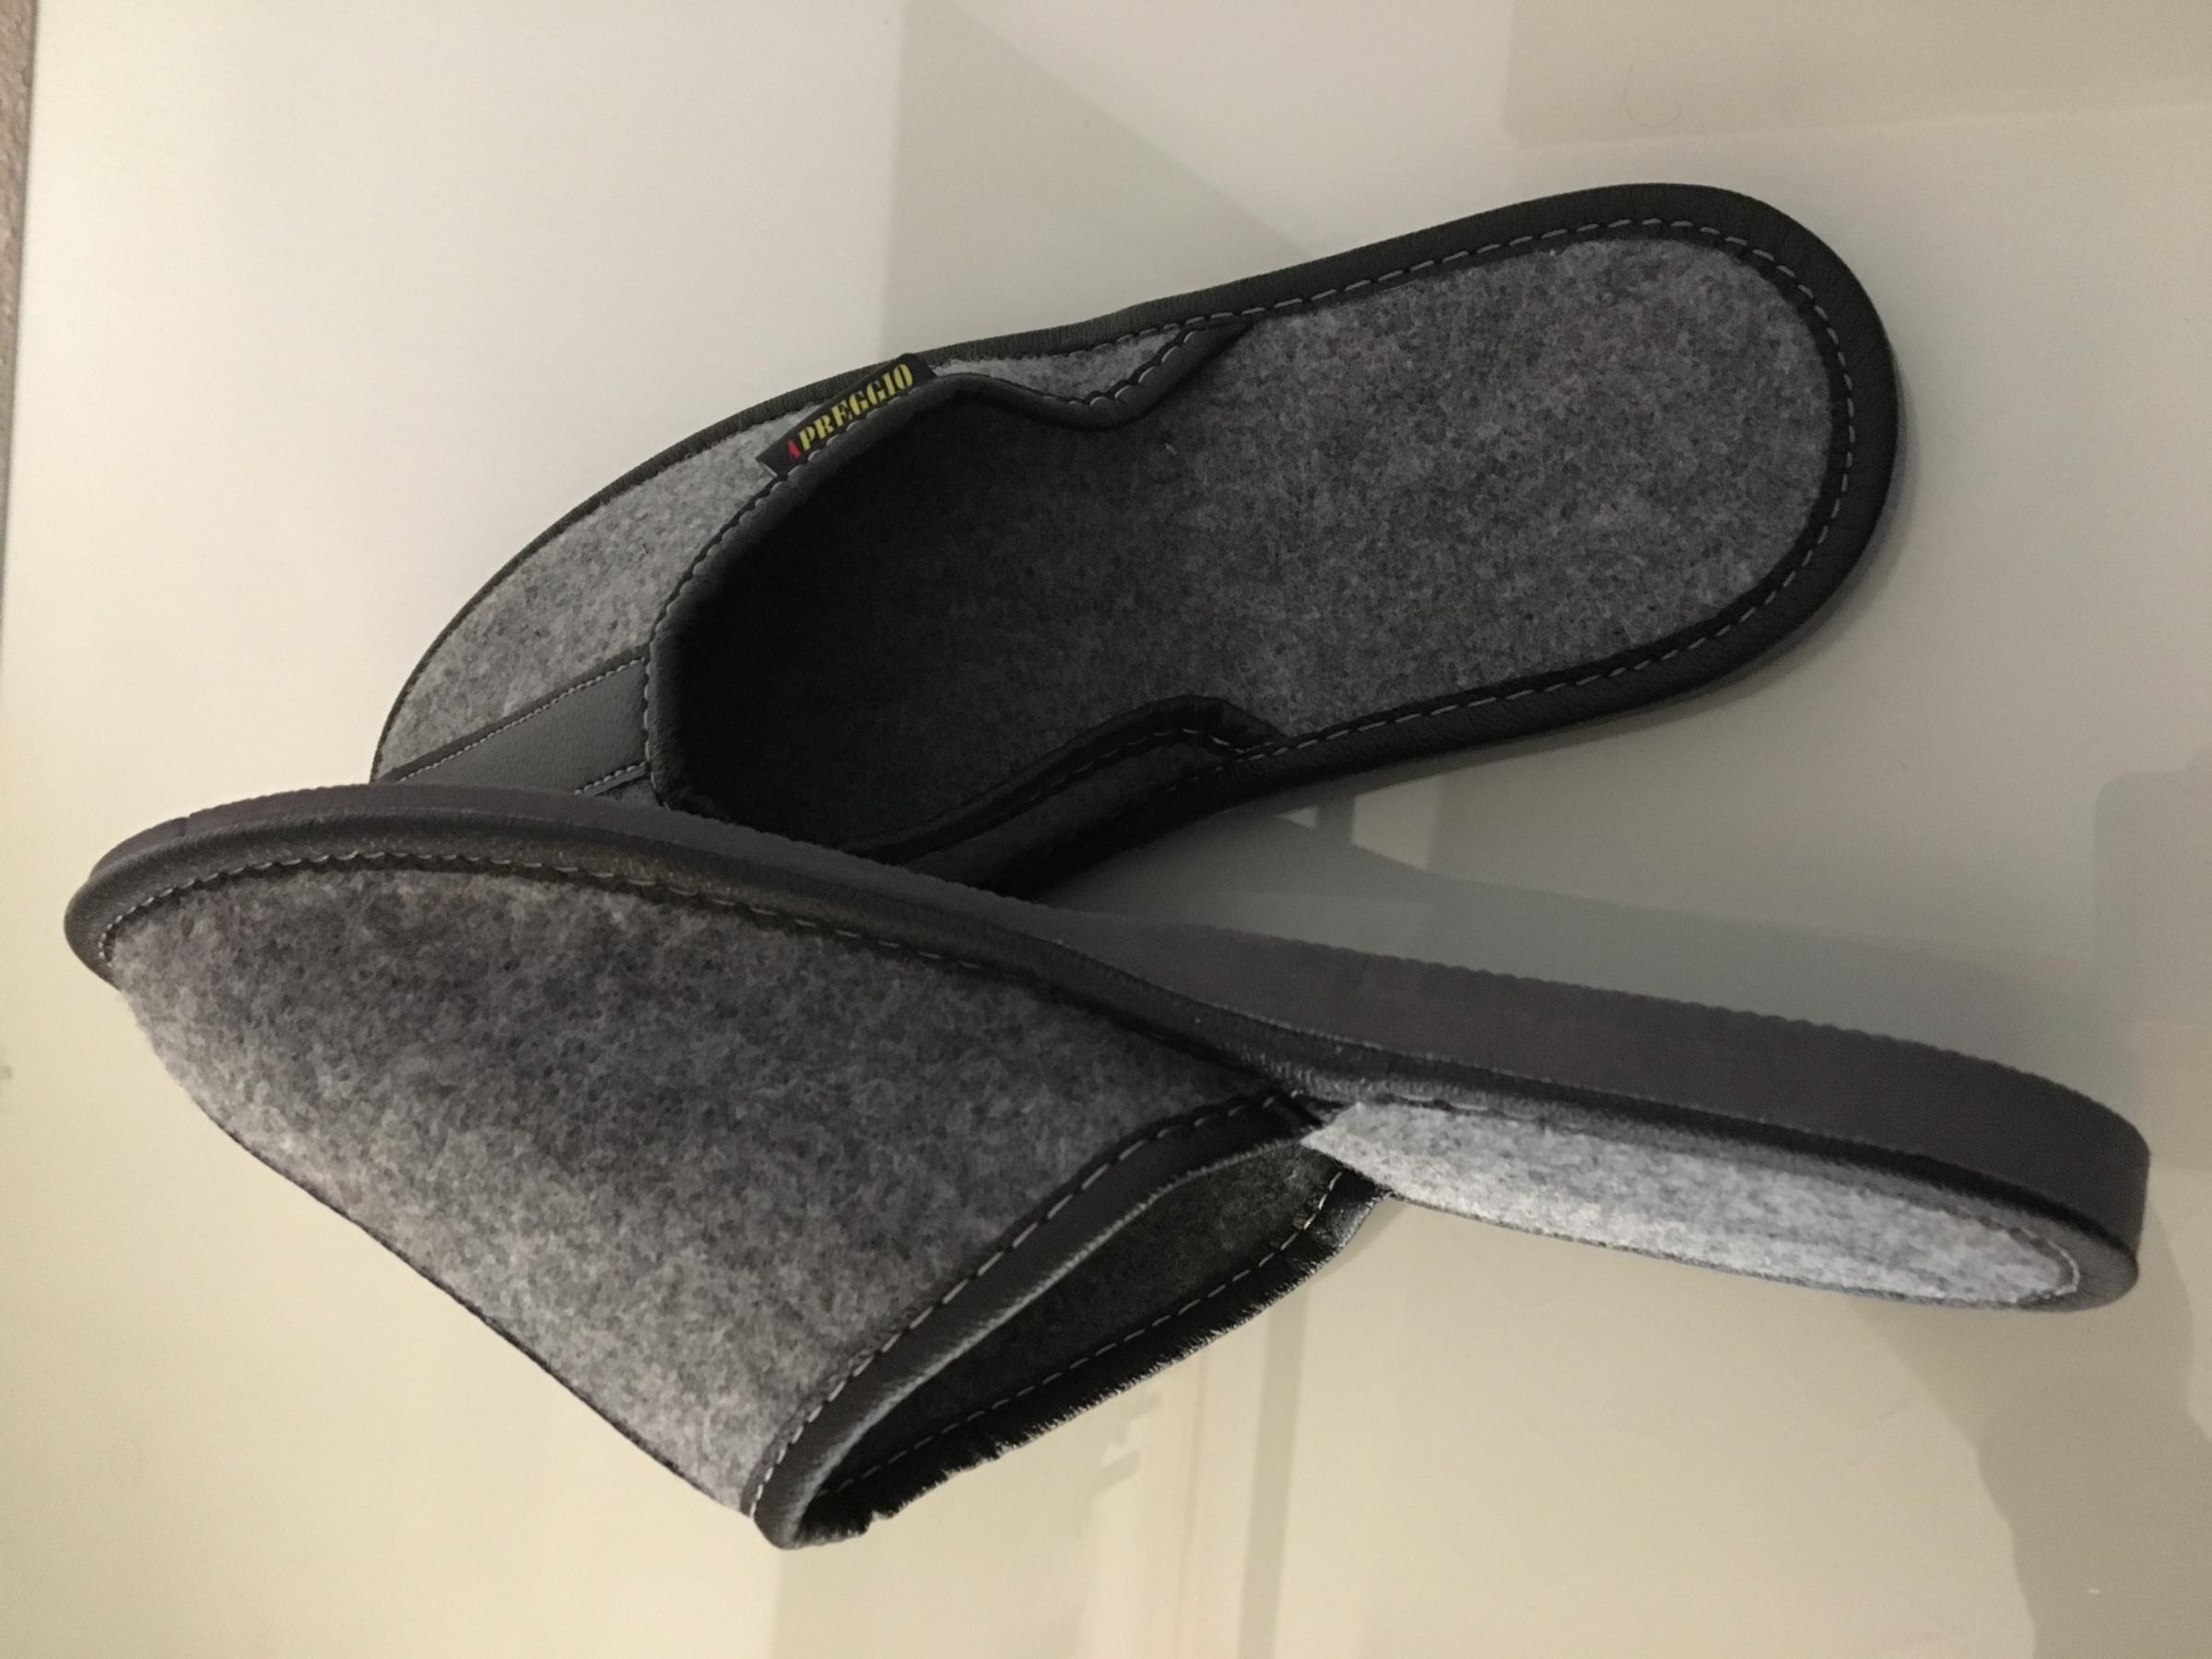 Apreggio Filzpantoffeln Herren Filz Hausschuhe Filzlatschen Wärme Komfortschuhe Grau Handgemachte Qualität